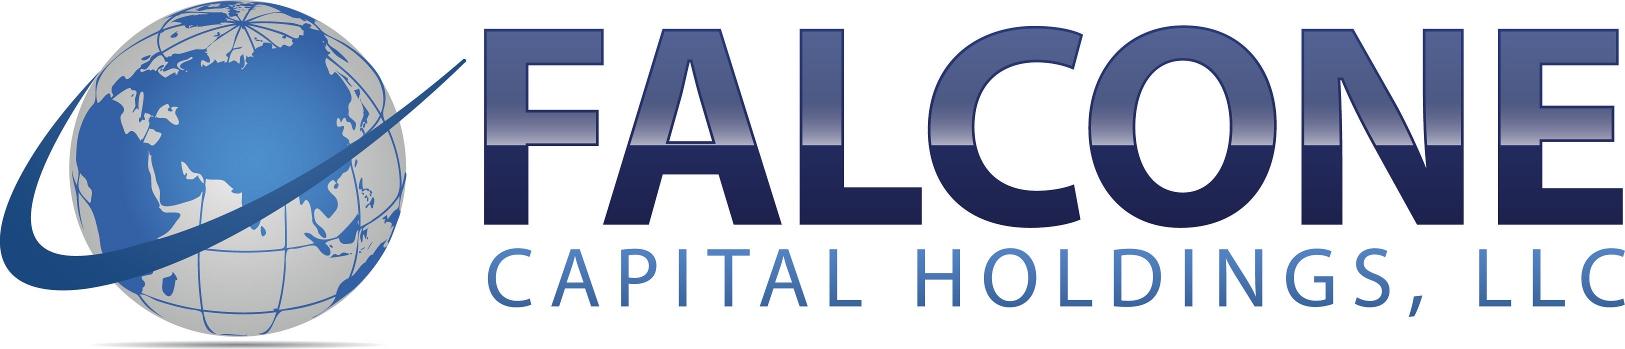 Aladdin Capital Holdings LLC Logo photo - 1